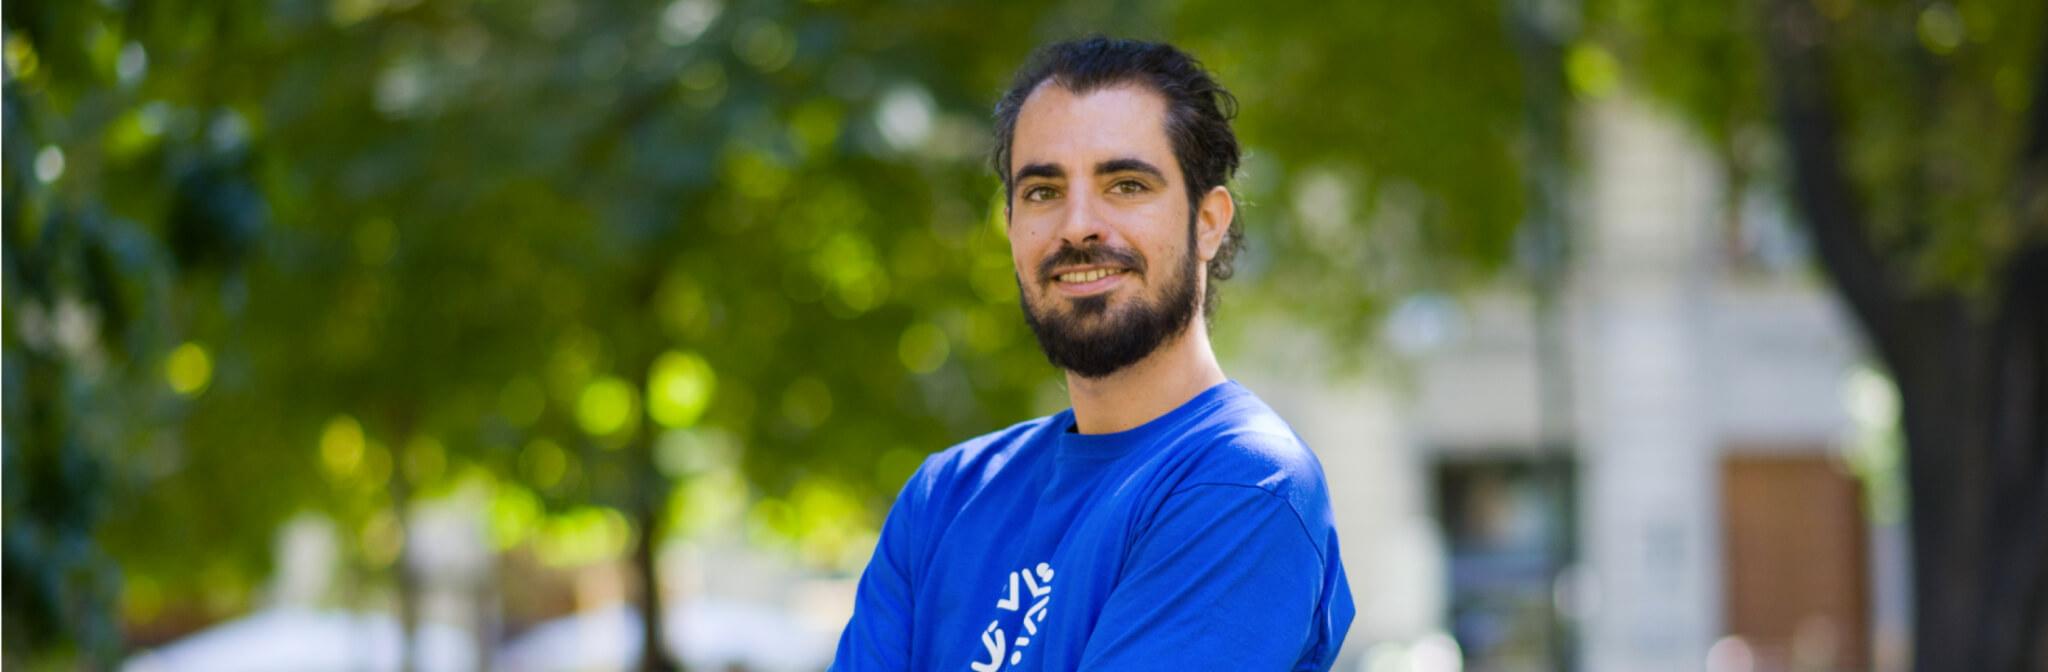 Scambiamo due parole con Marco Pollara, la mente informatica di Axieme